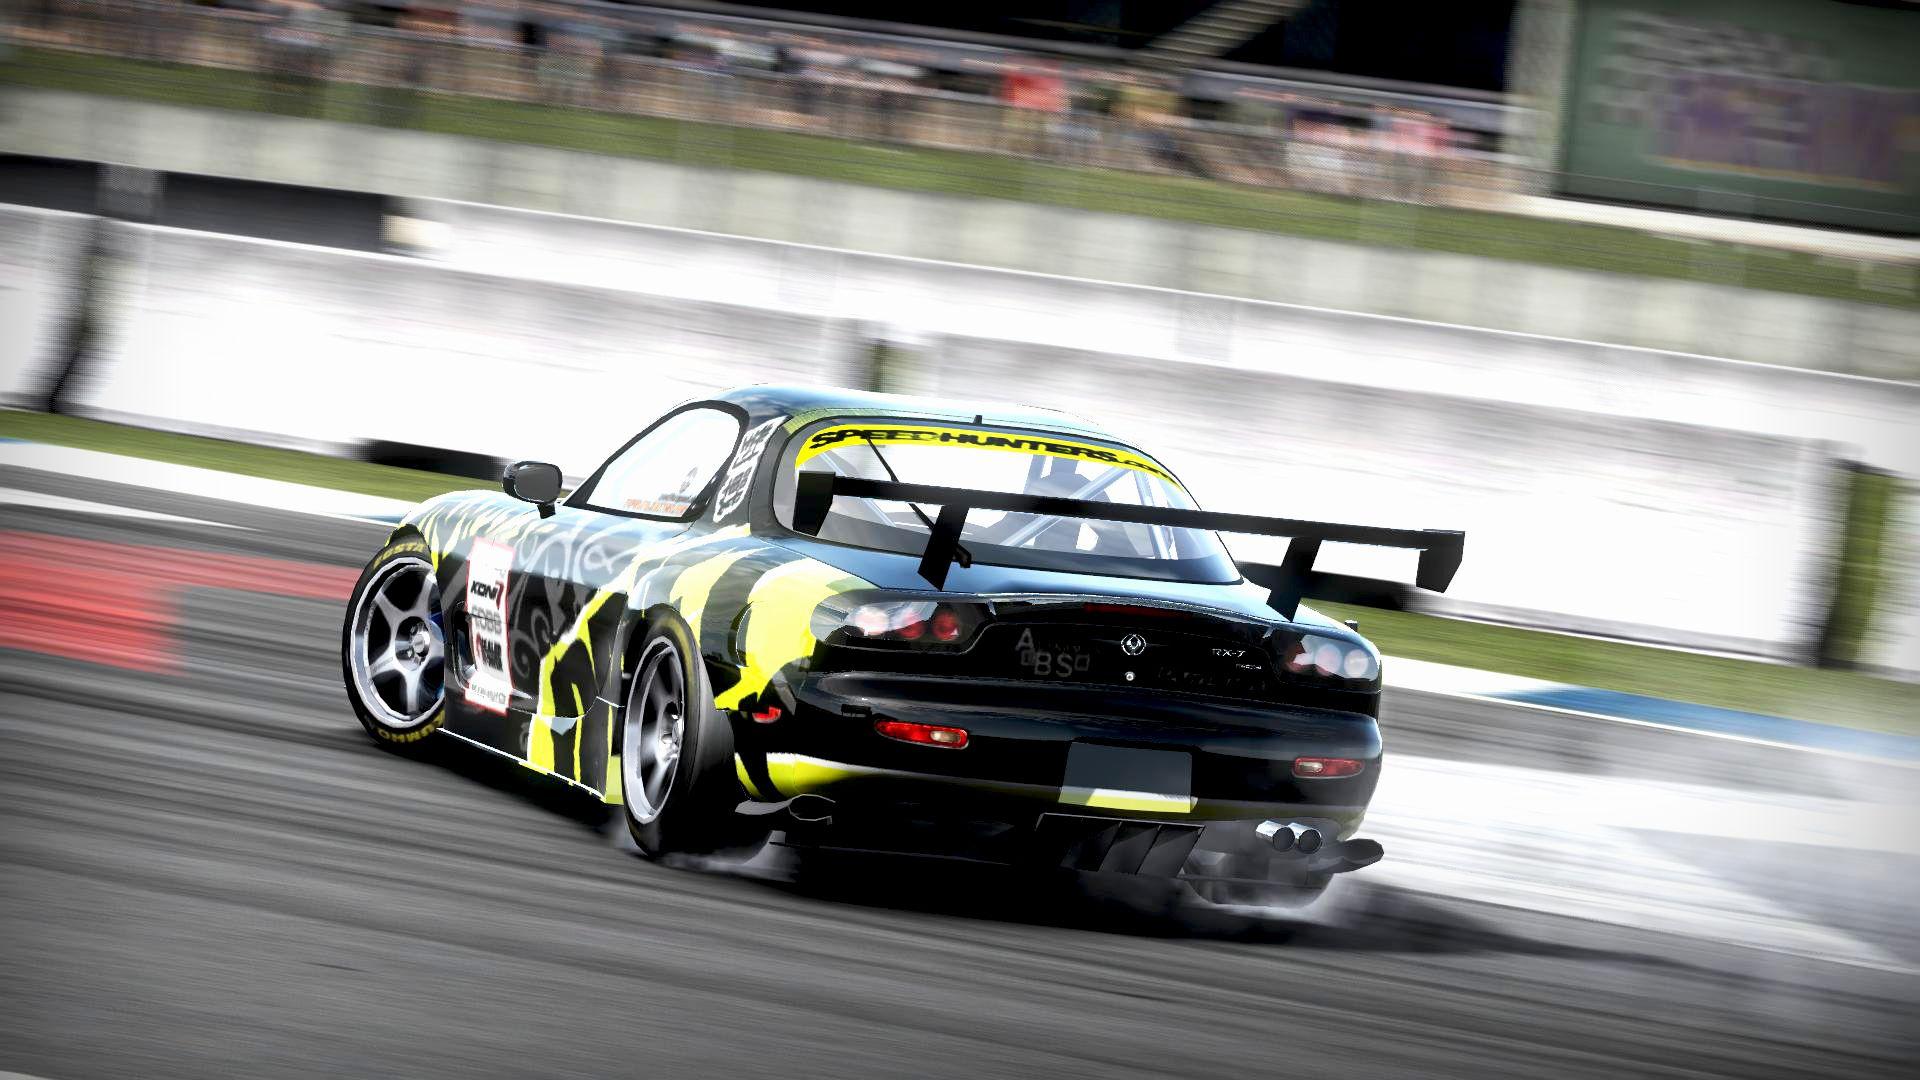 Smoke Mazda Drift Tuning Toyota Racing Cars Racing Cars